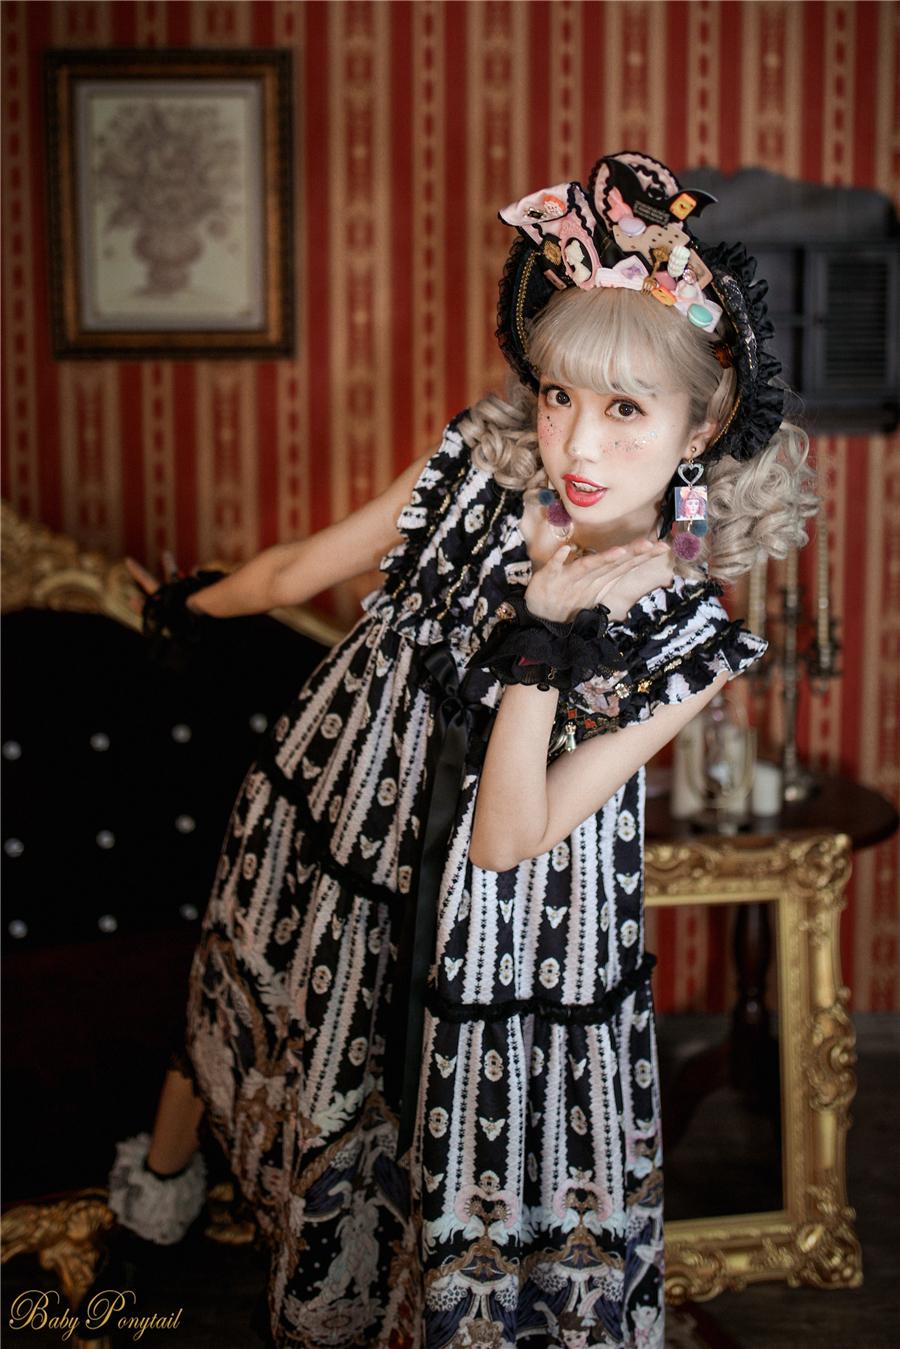 BabyPonytail_Model Photo_My Favorite Companion_NG Black_Kaka_1_7.jpg